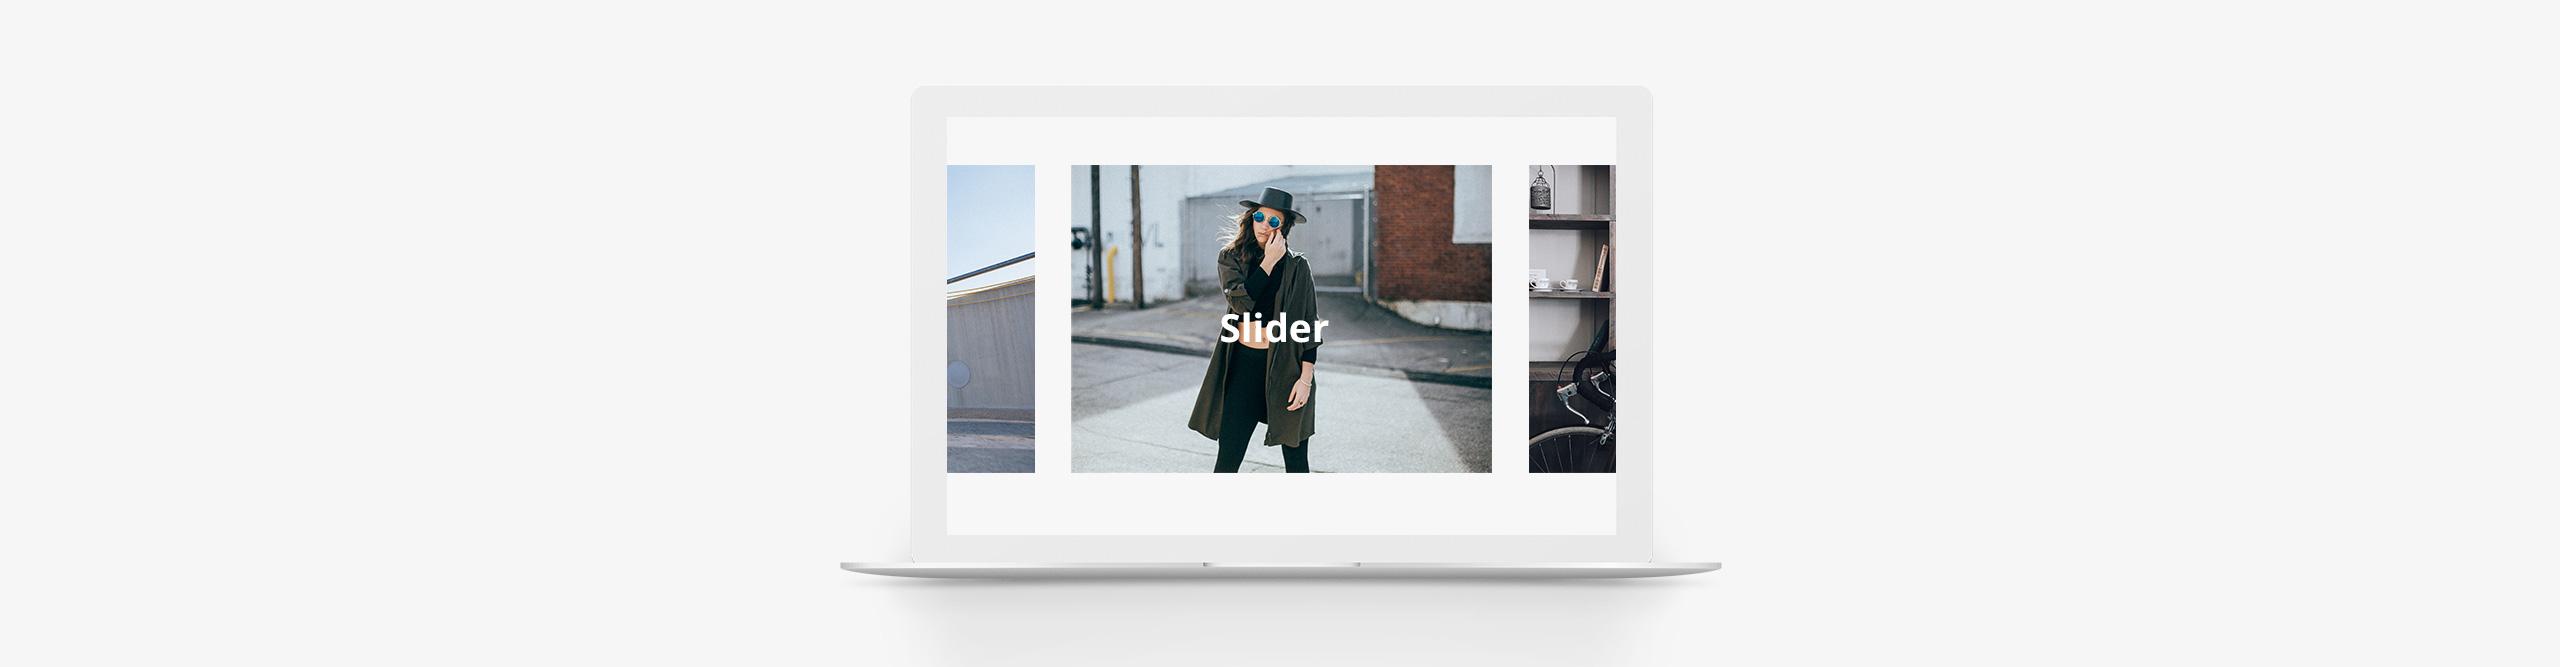 YOOtheme Pro 1 11 – Introducing a new Slider element - YOOtheme